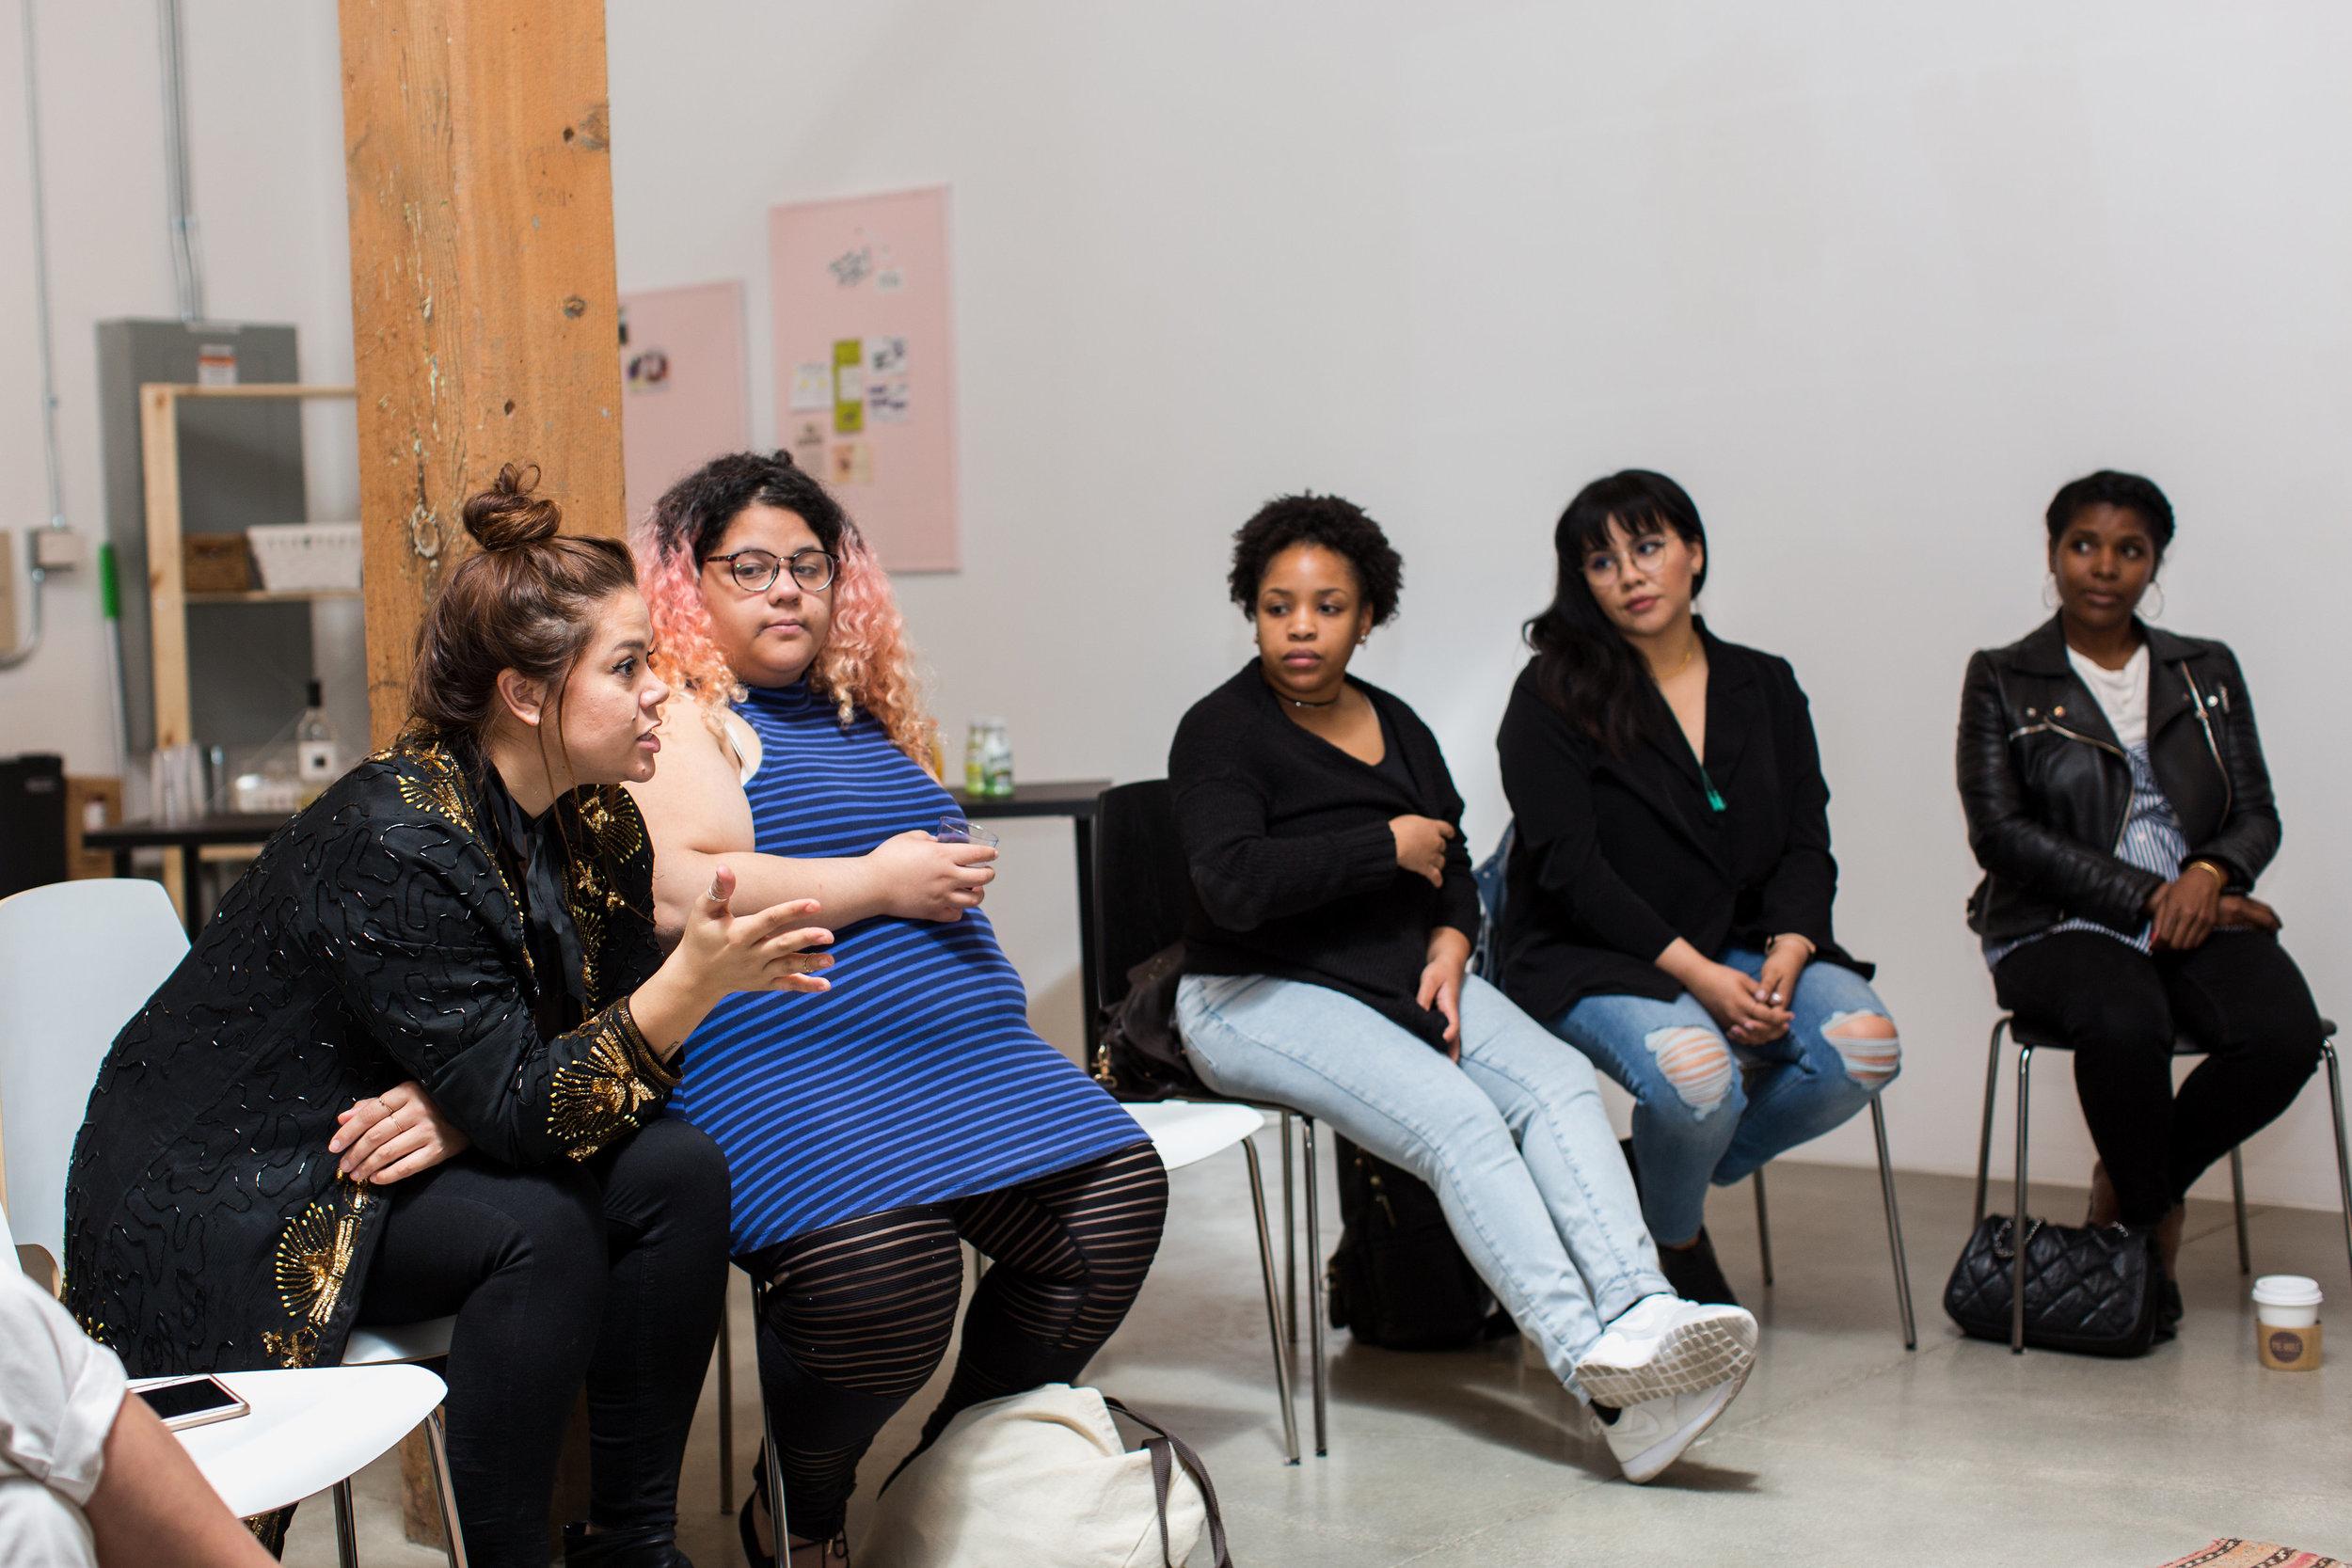 jig+saw-profresh-womens community-los angeles-row dtla-christina topacio